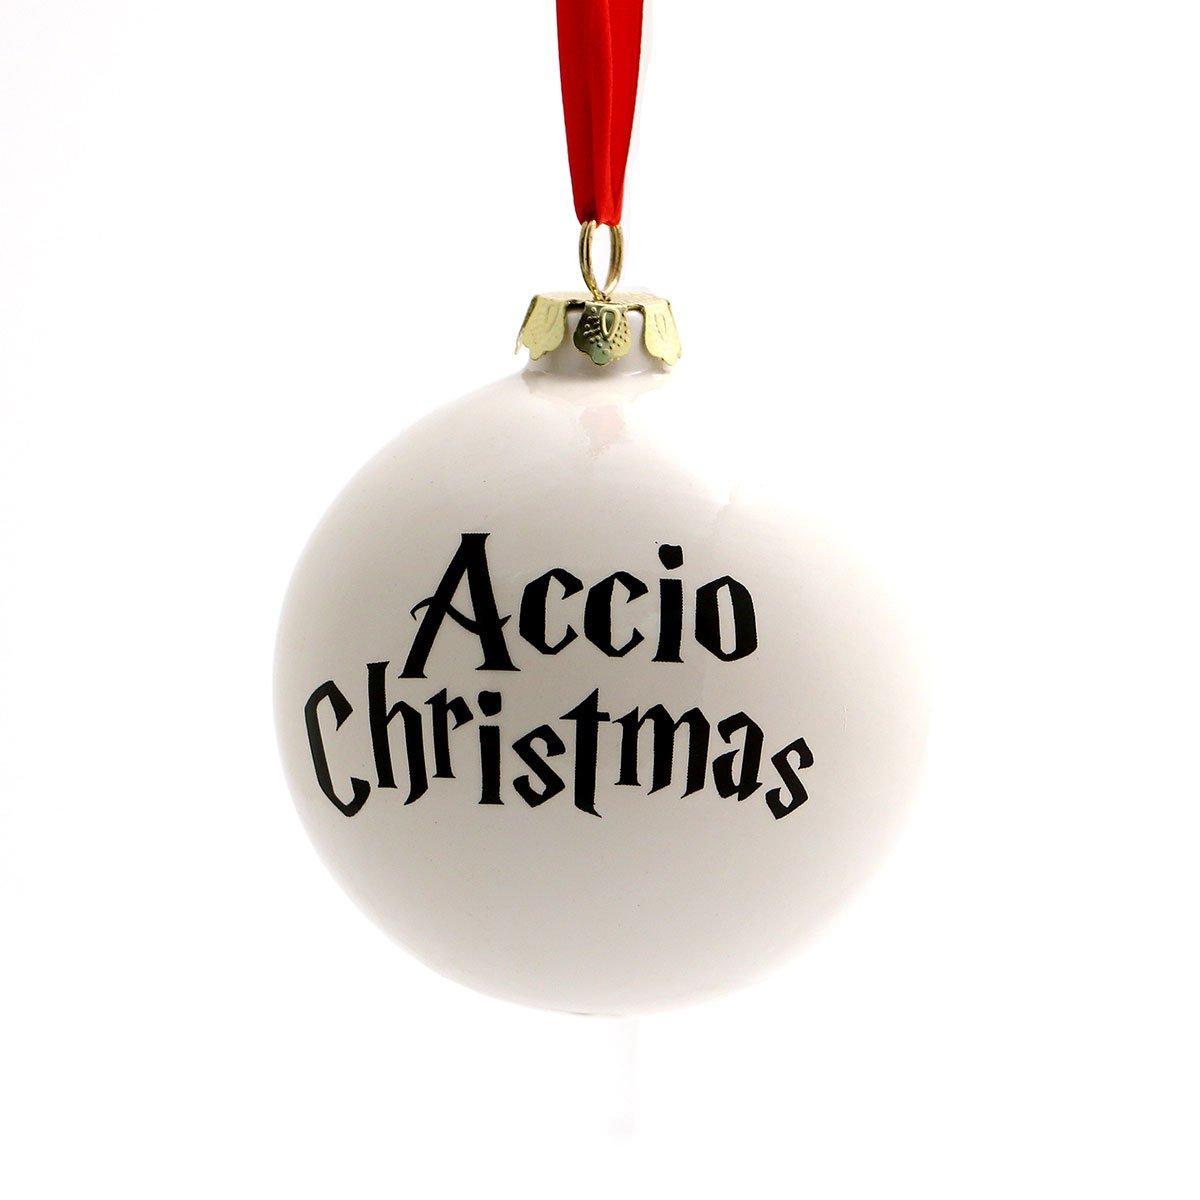 Amazon.com: Harry Potter Accio Christmas Ornament: Handmade